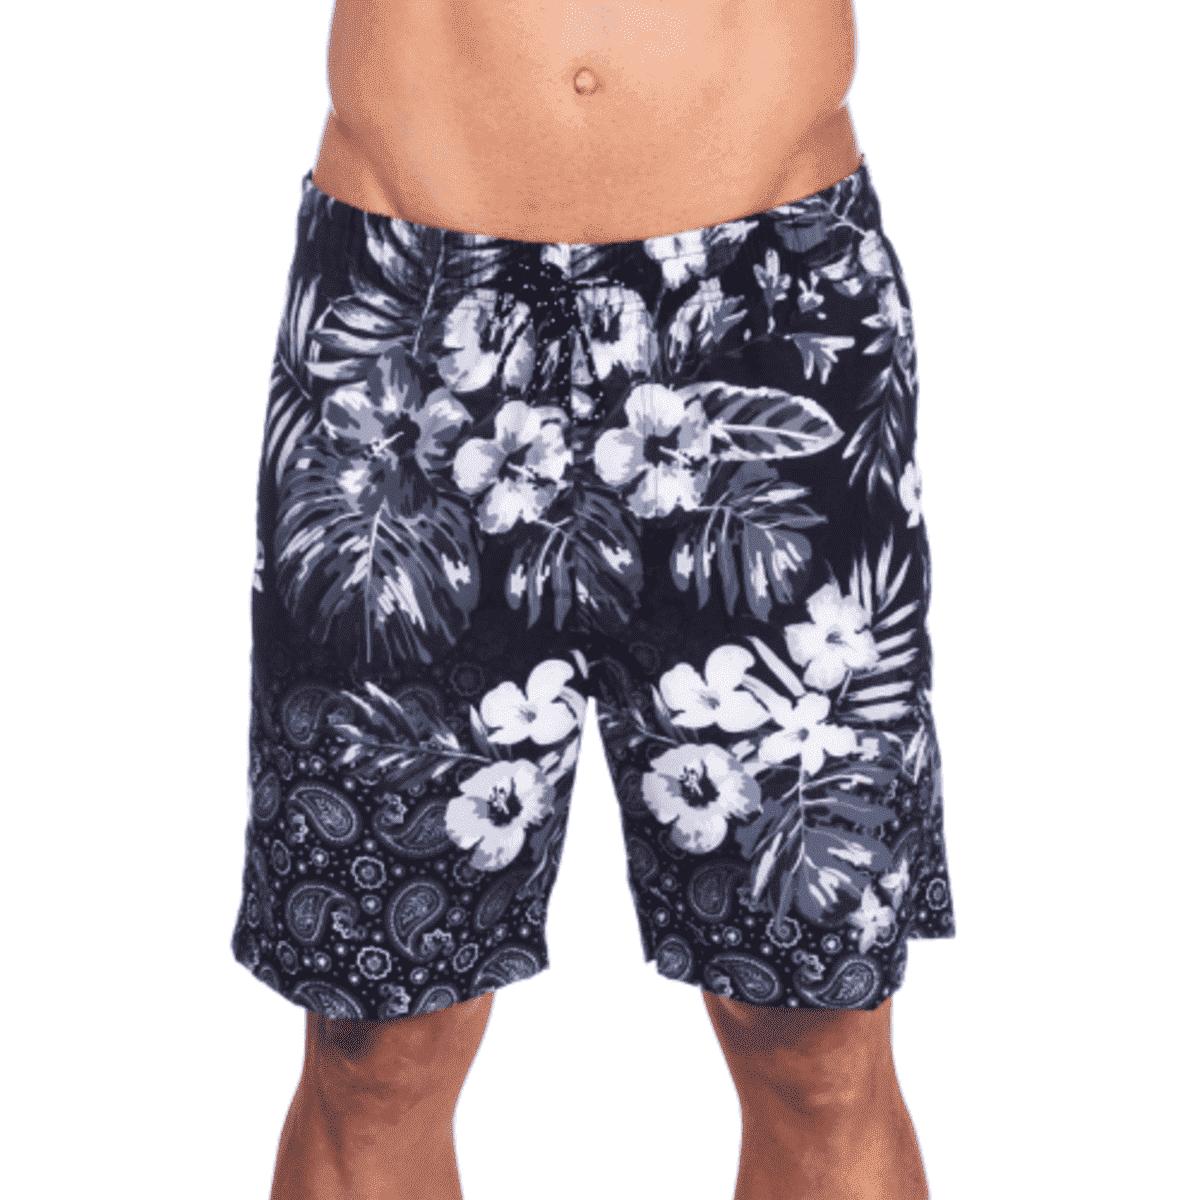 Kit 7 Short Bermuda Moletom Masculina Florida Floral Atacado